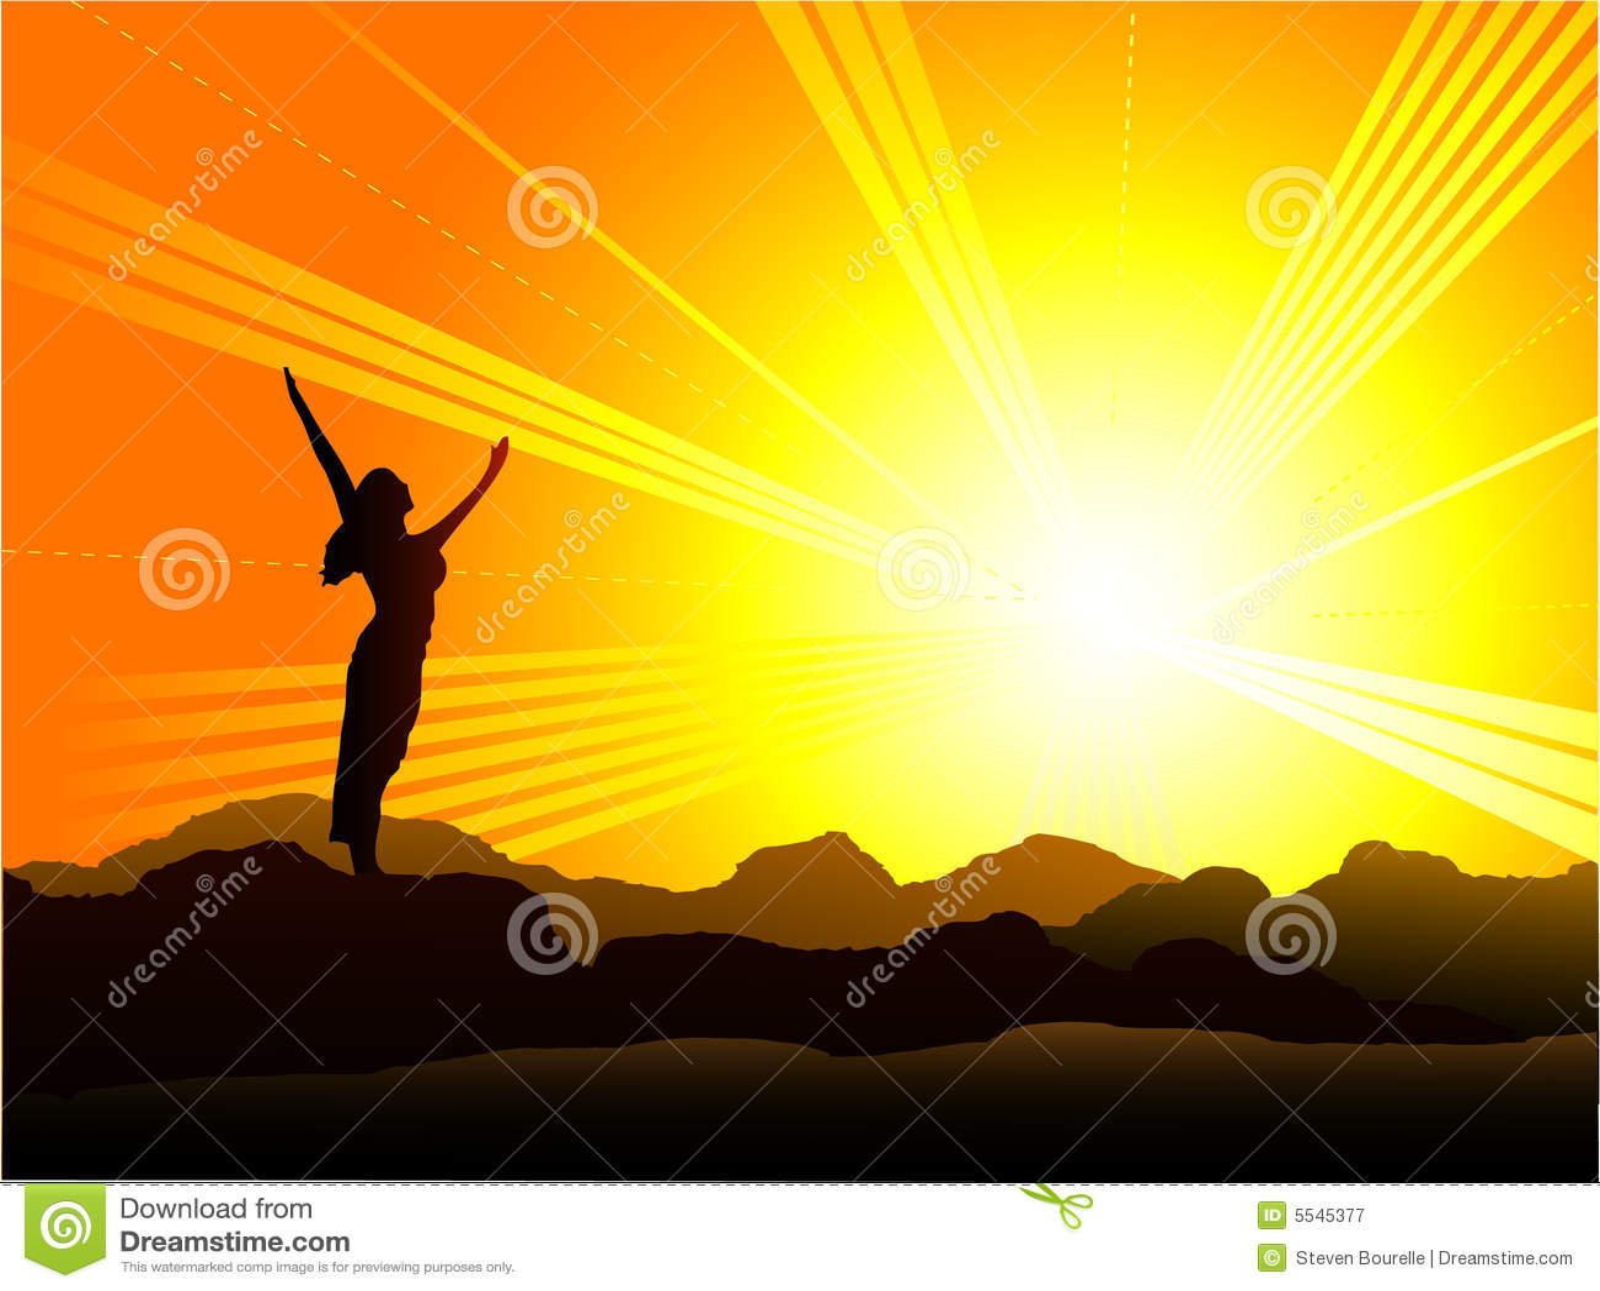 Goodmorning sunrise stock vector. Illustration of yoga